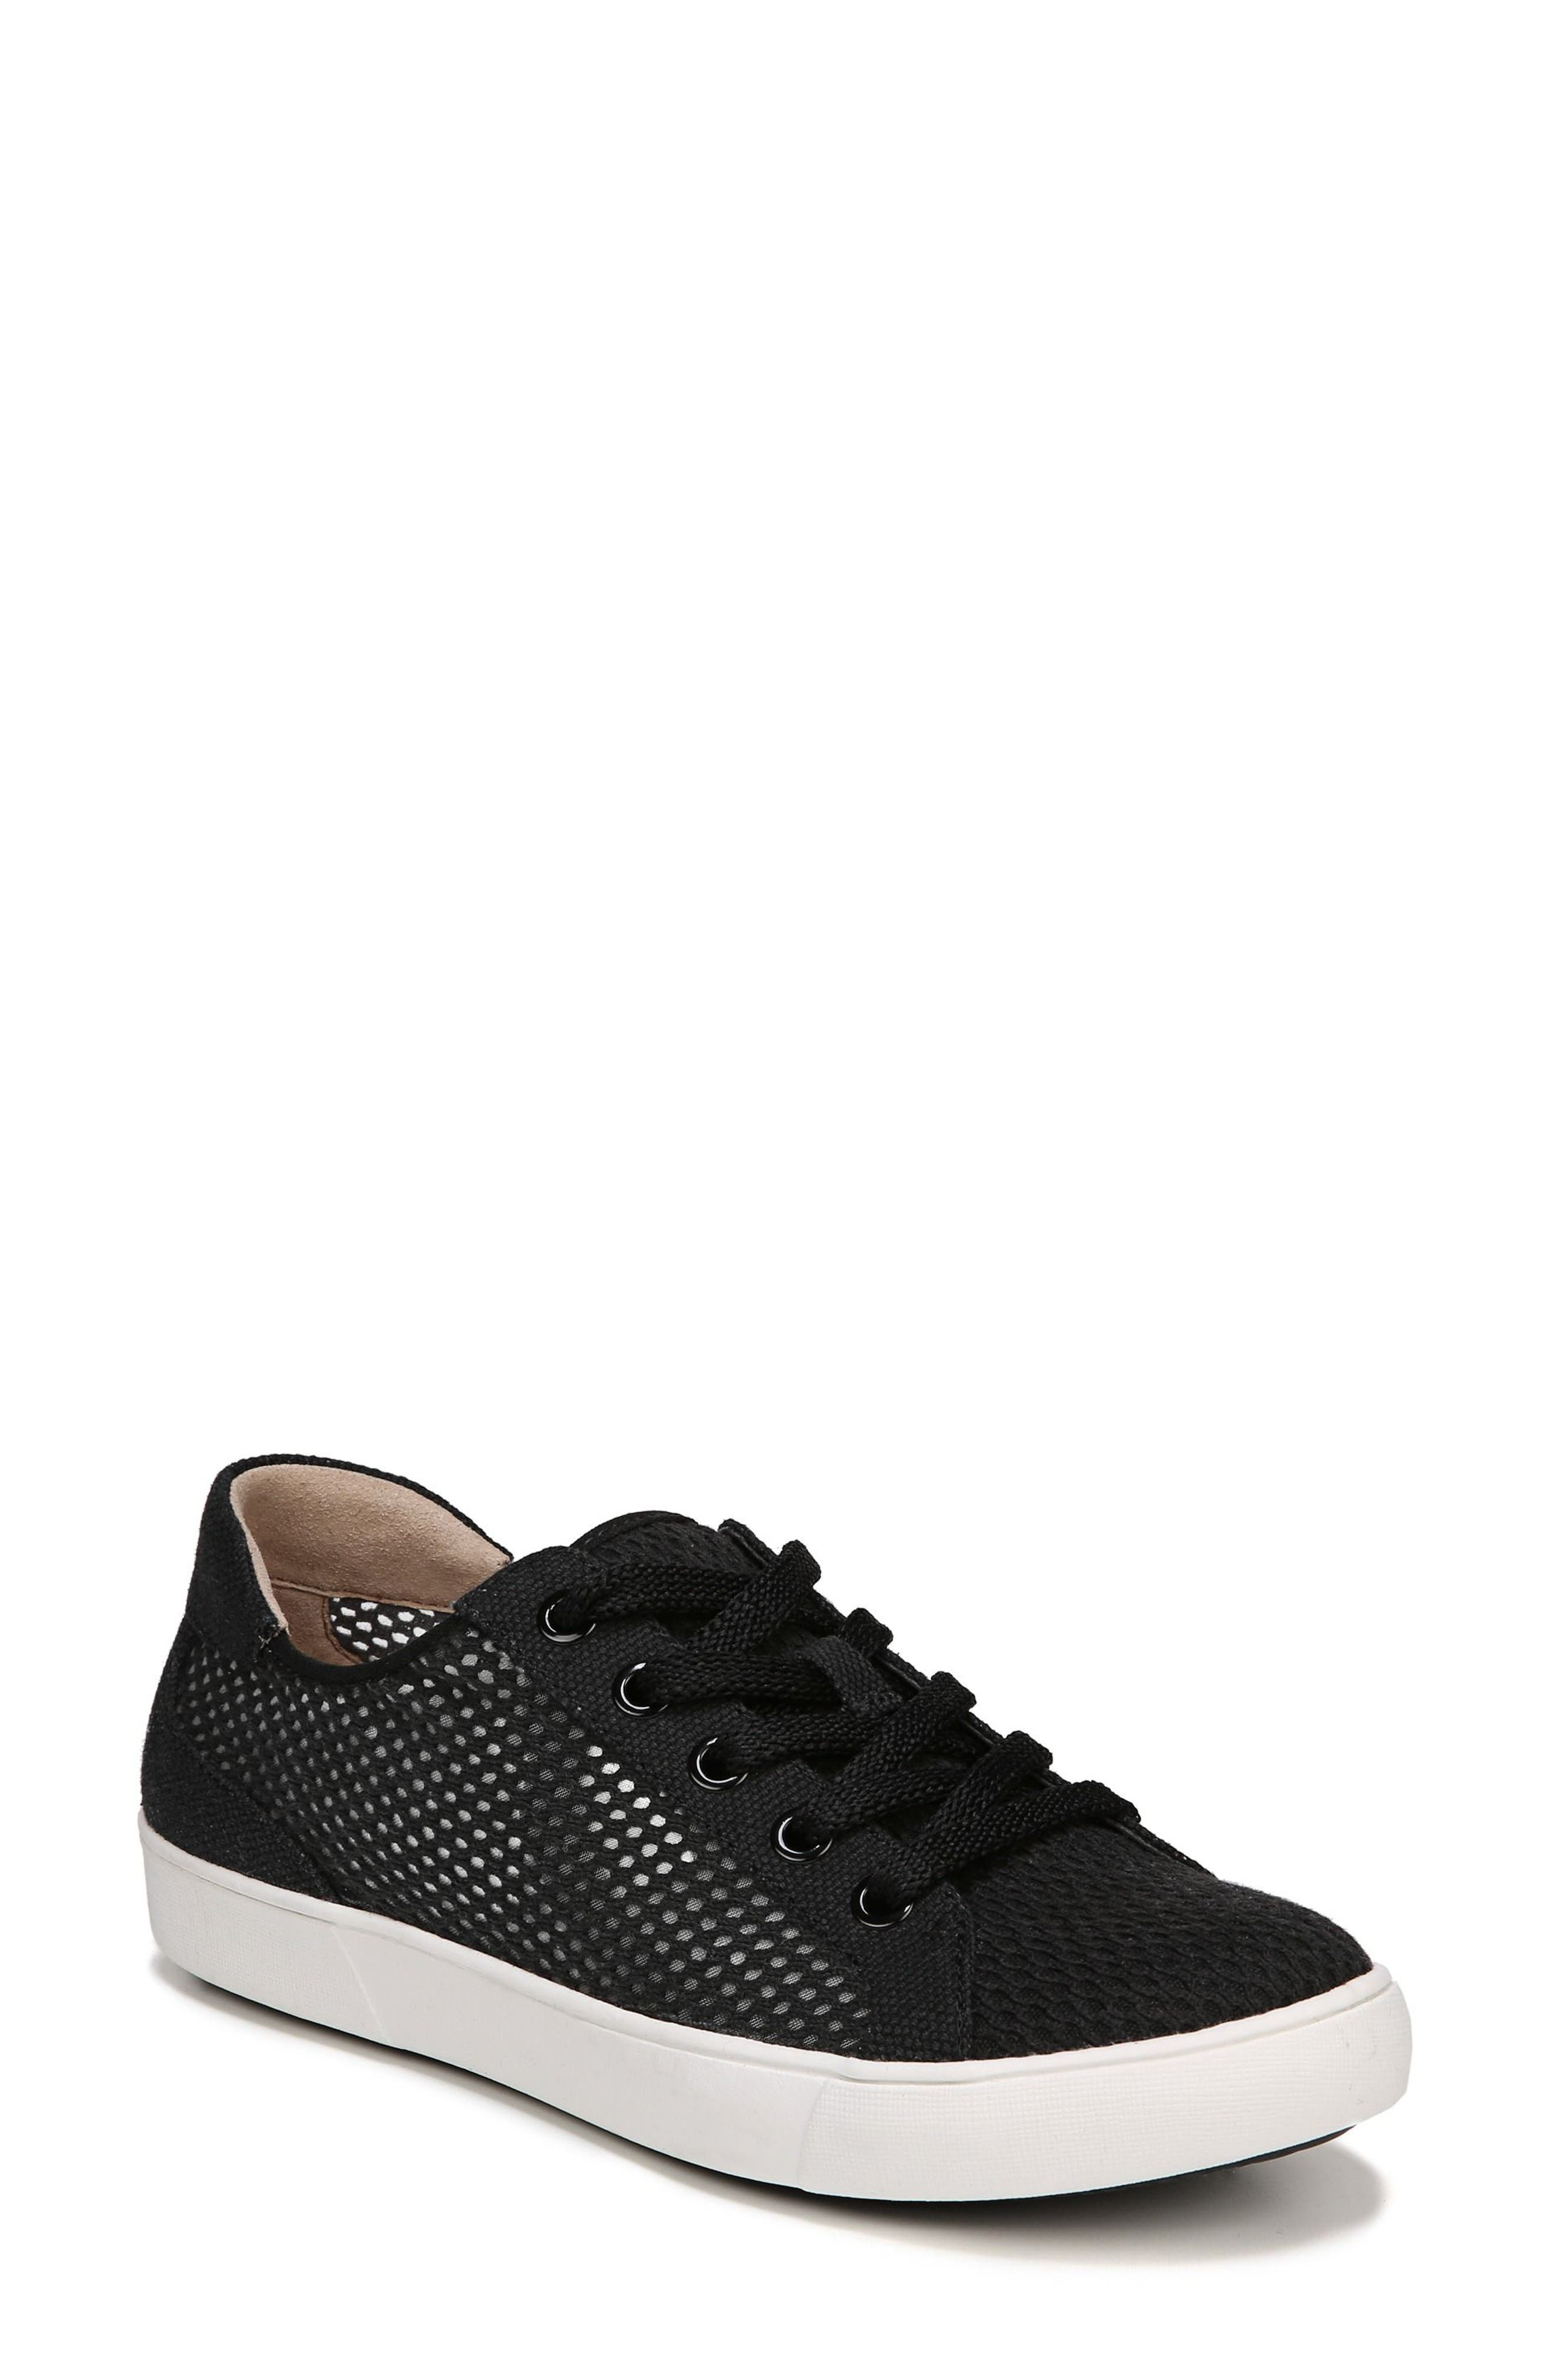 Morrison III Perforated Sneaker,                             Main thumbnail 1, color,                             BLACK FABRIC